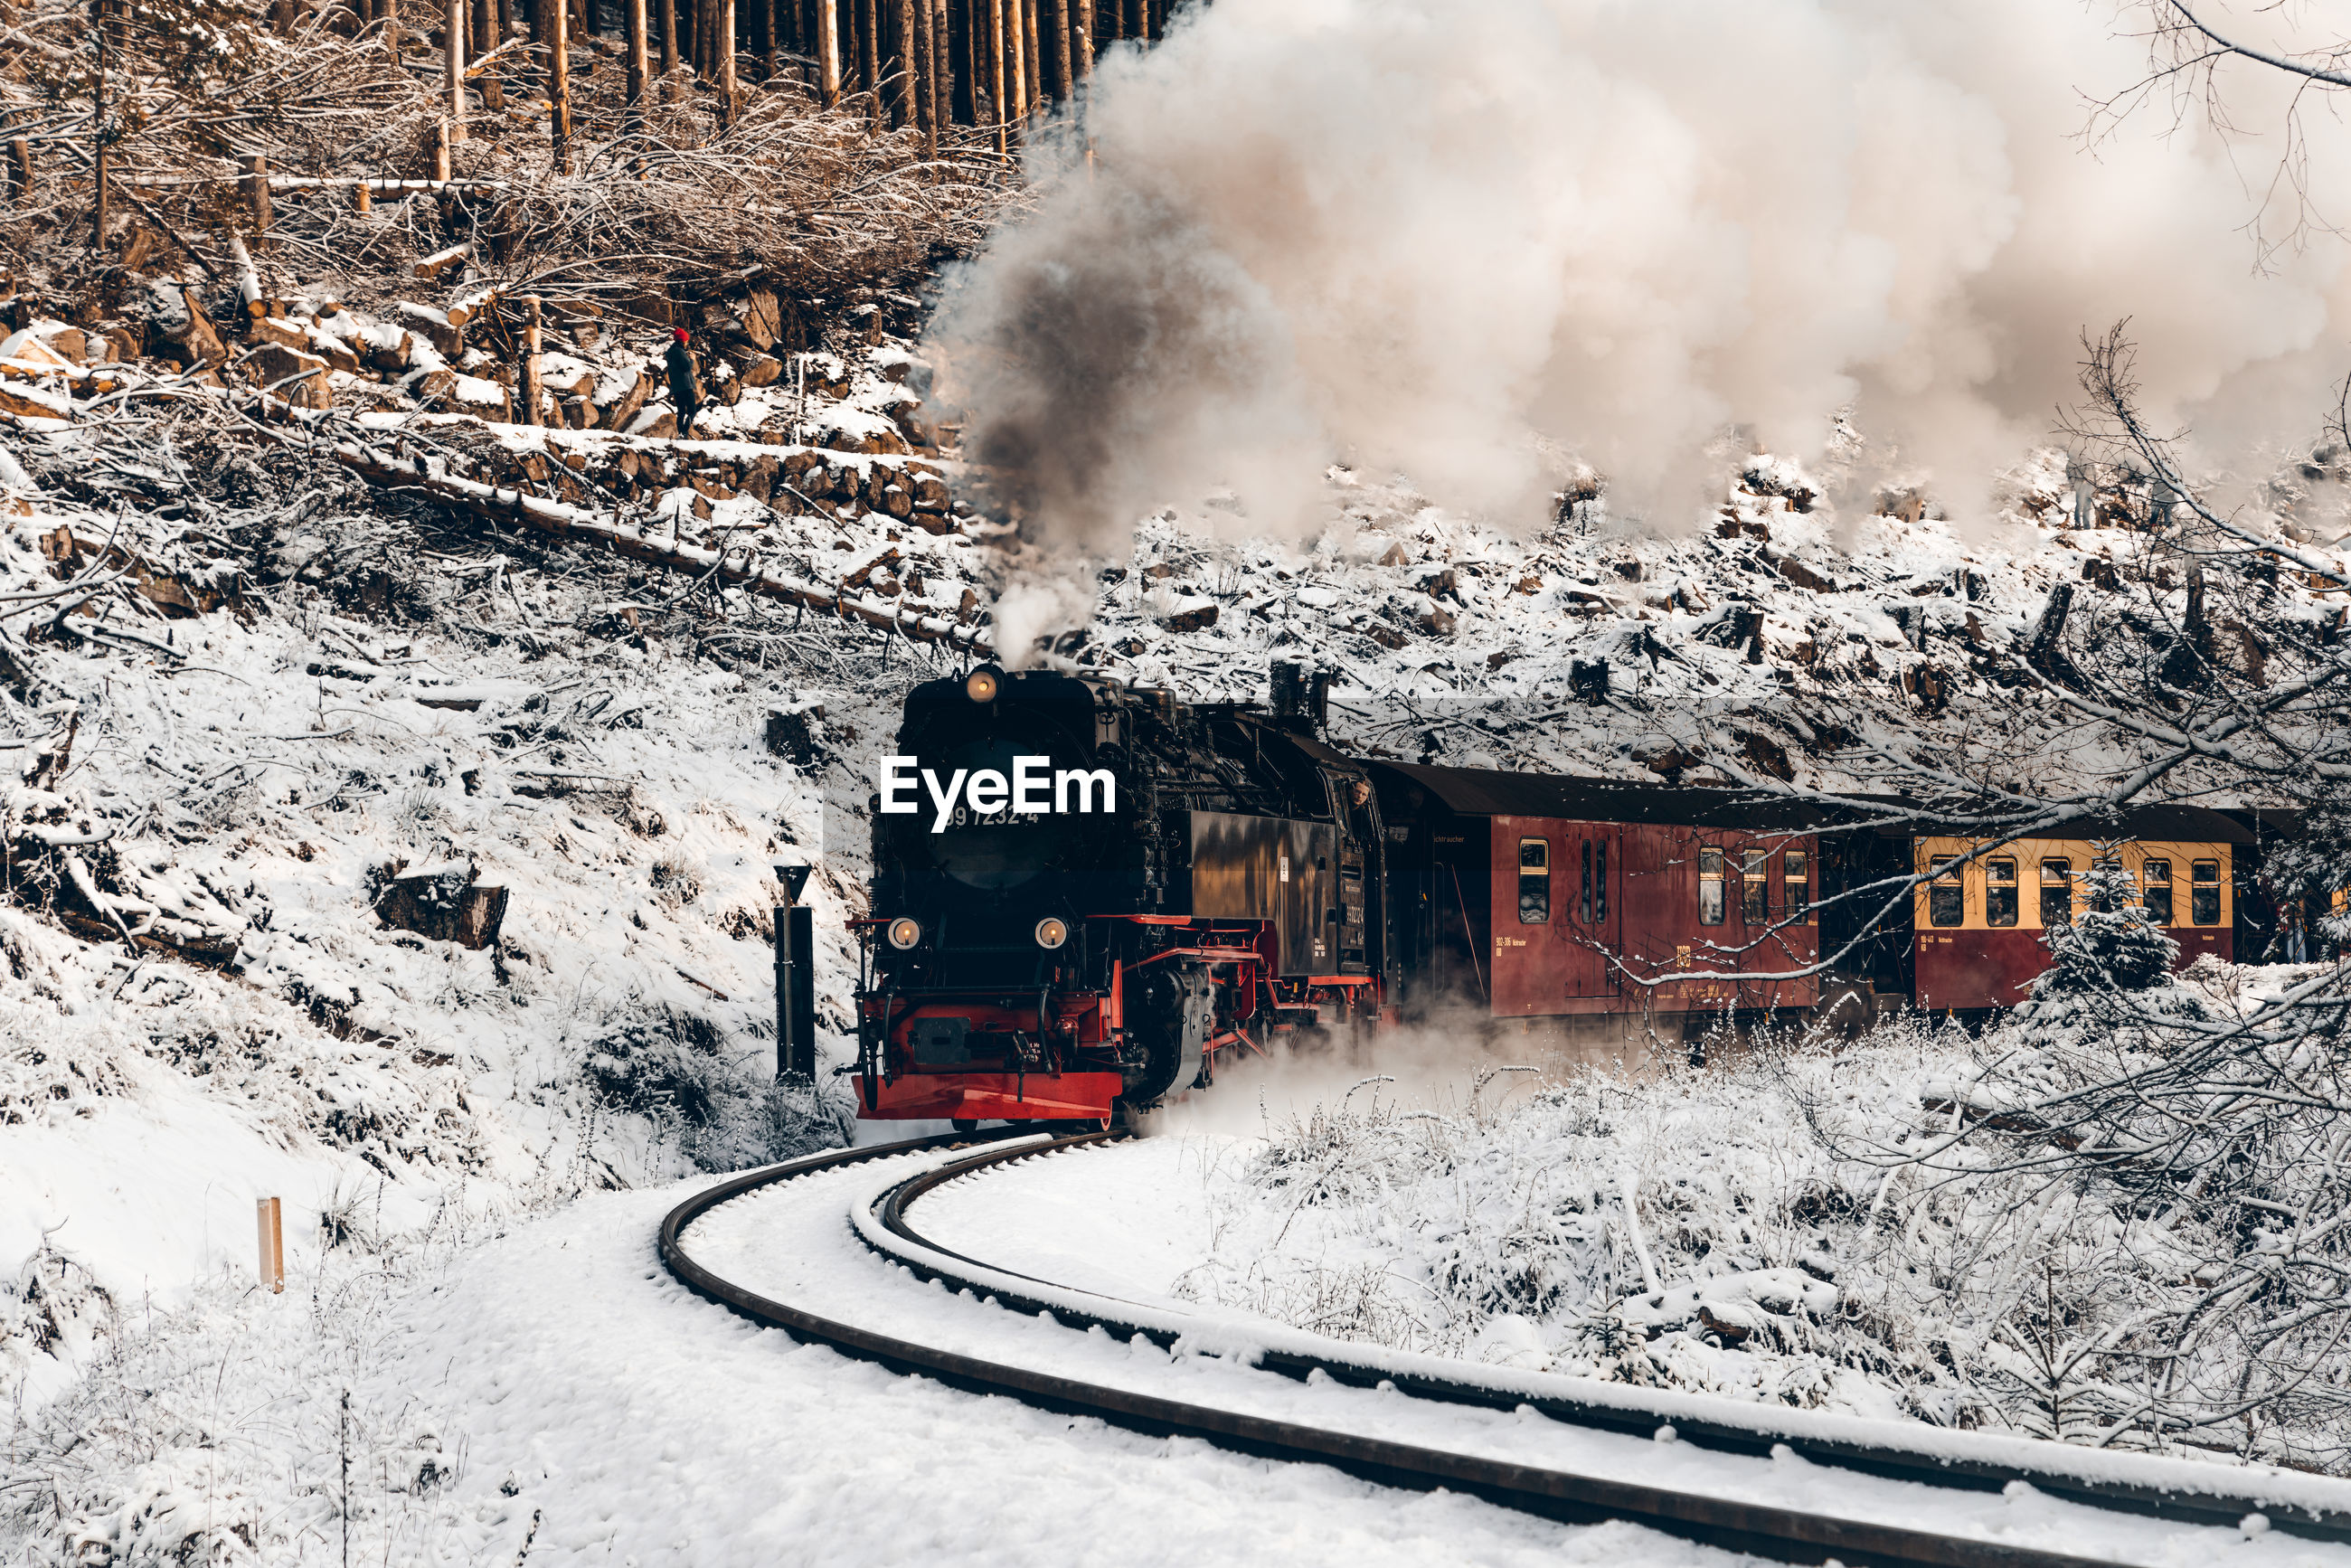 TRAIN ON SNOW COVERED RAILROAD TRACKS